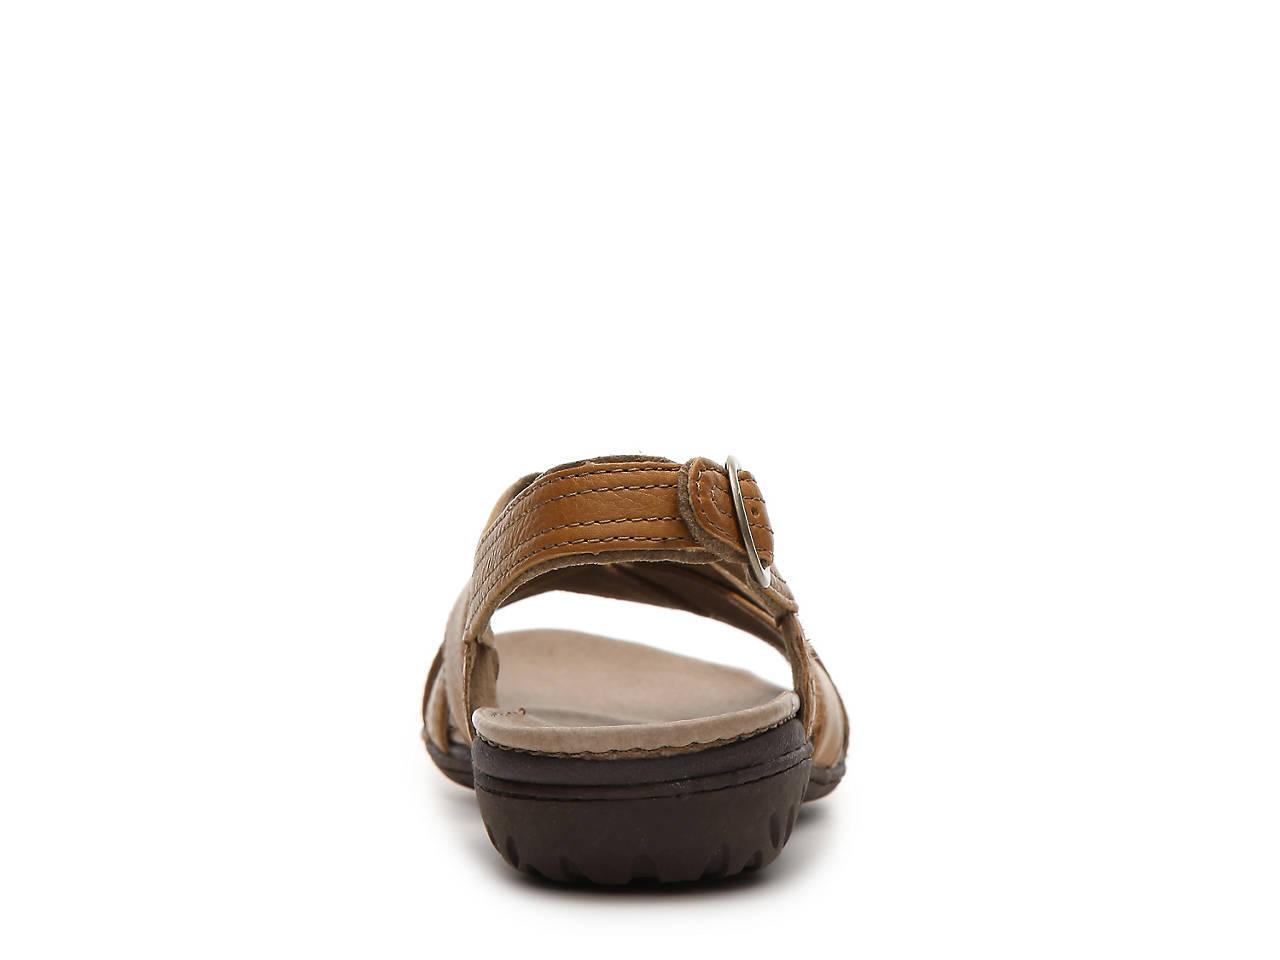 63bf97574aeb Merrell Bassoon Flat Sandal Women s Shoes